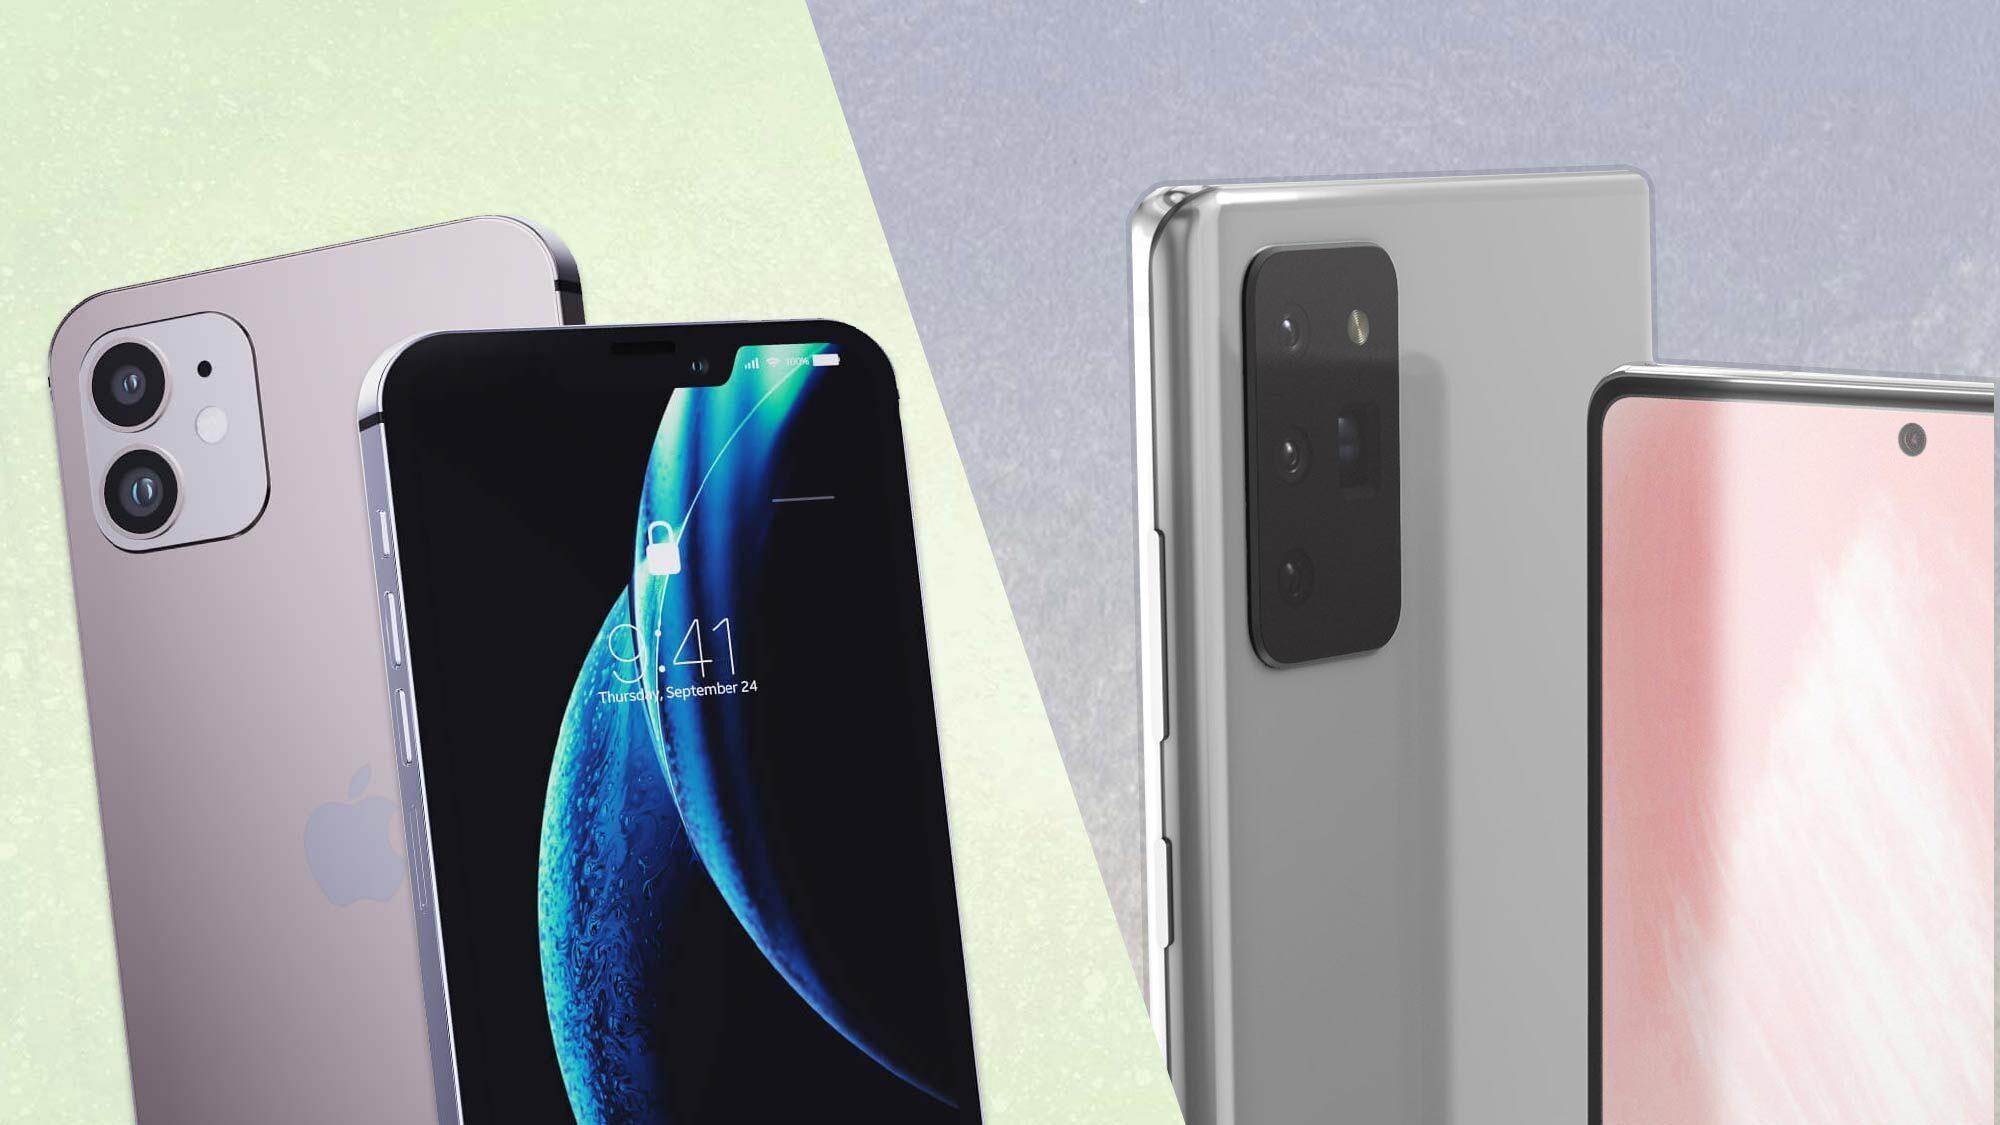 مقایسه دوربین گوشیهای iPhone 12 Pro Max و Galaxy Note 20 Ultra